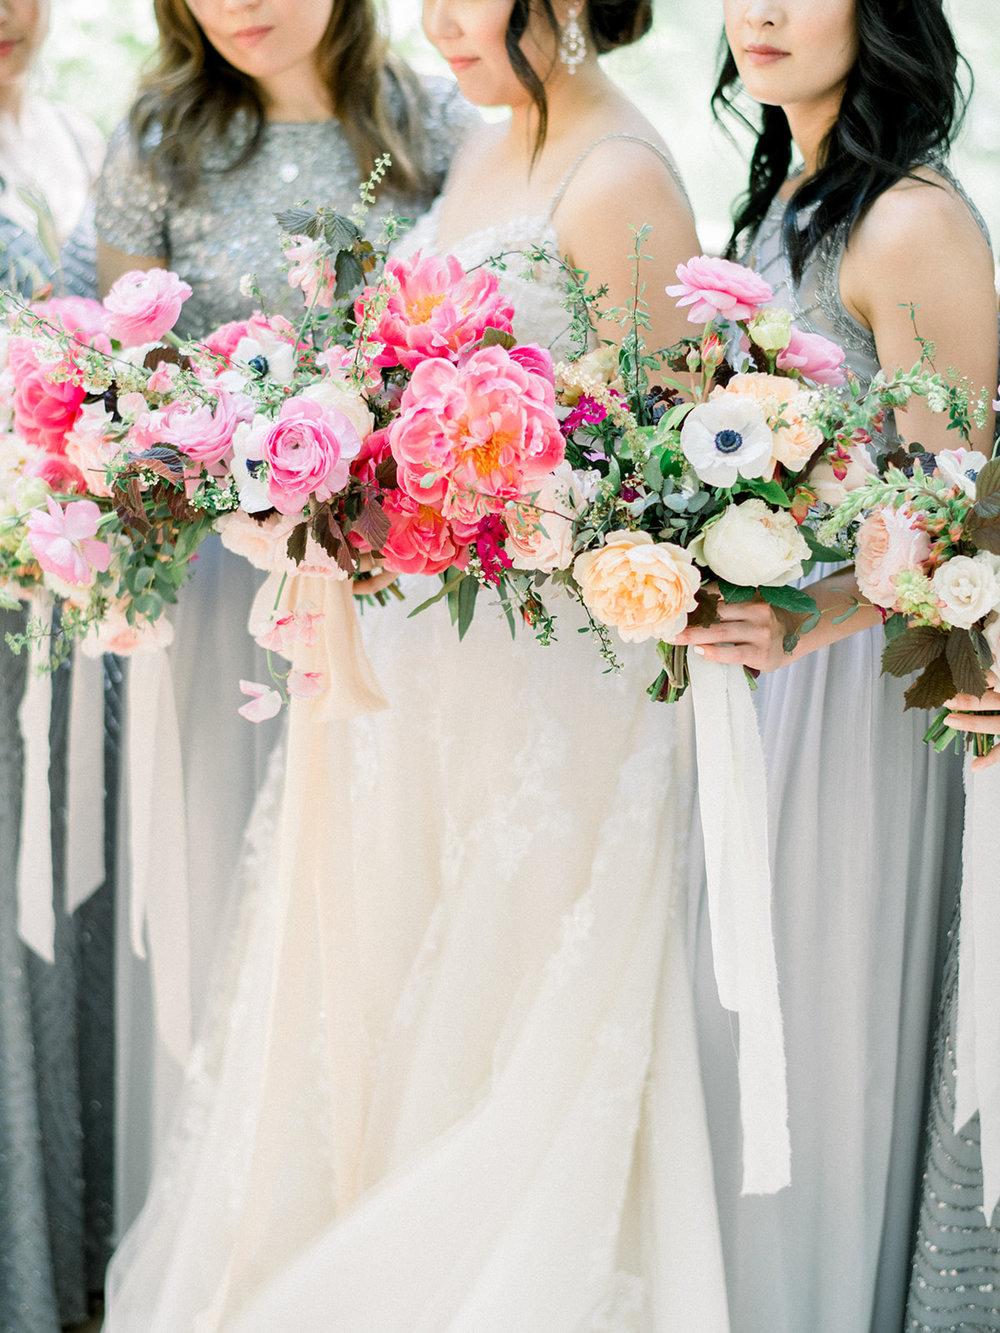 jueunandjon-etherandsmith-wedding-427.jpg